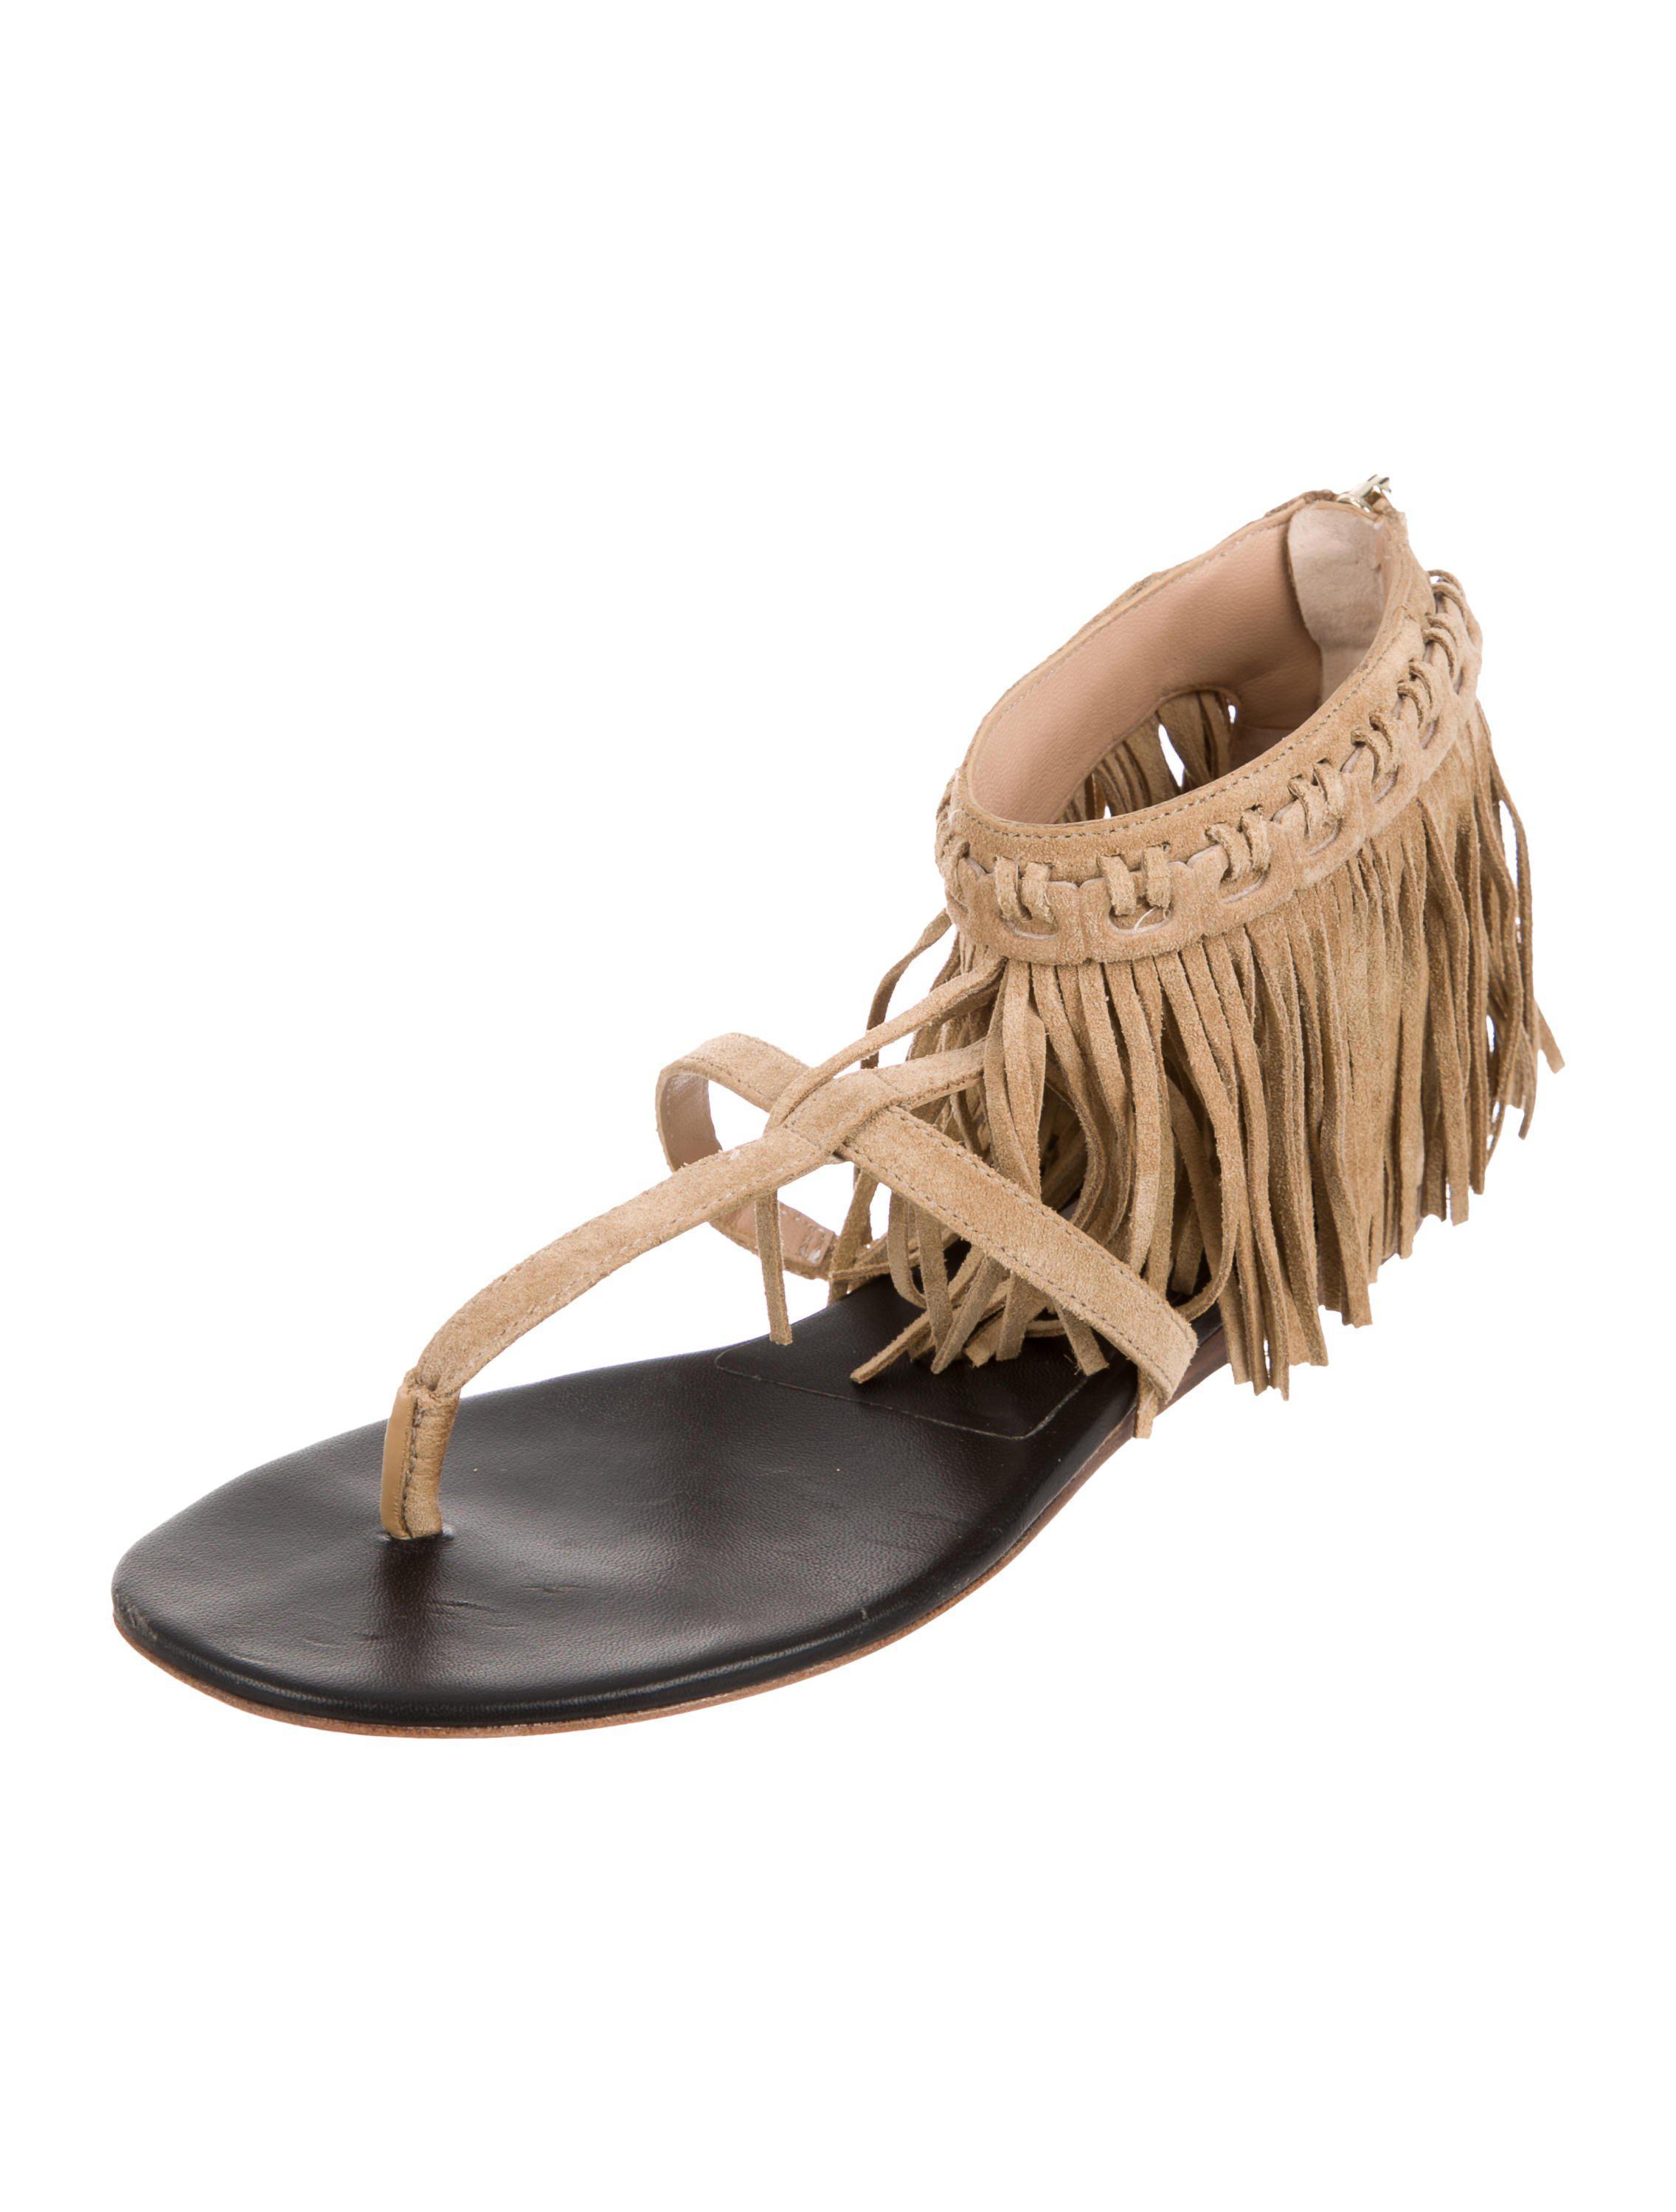 Diane von Furstenberg Fringe-Trimmed T-Strap Sandals new GCa0opV0gq